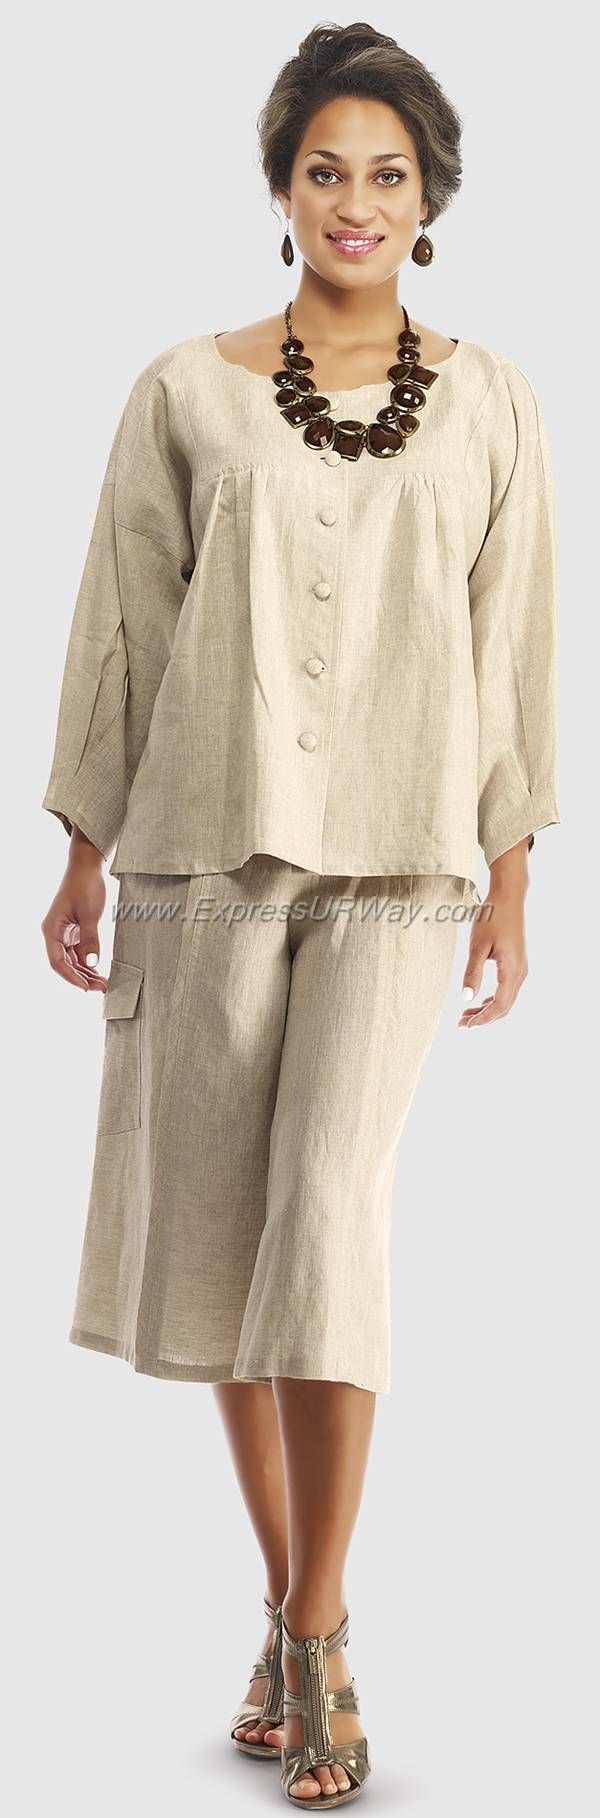 1000 images about clothesplus size clothing websites on